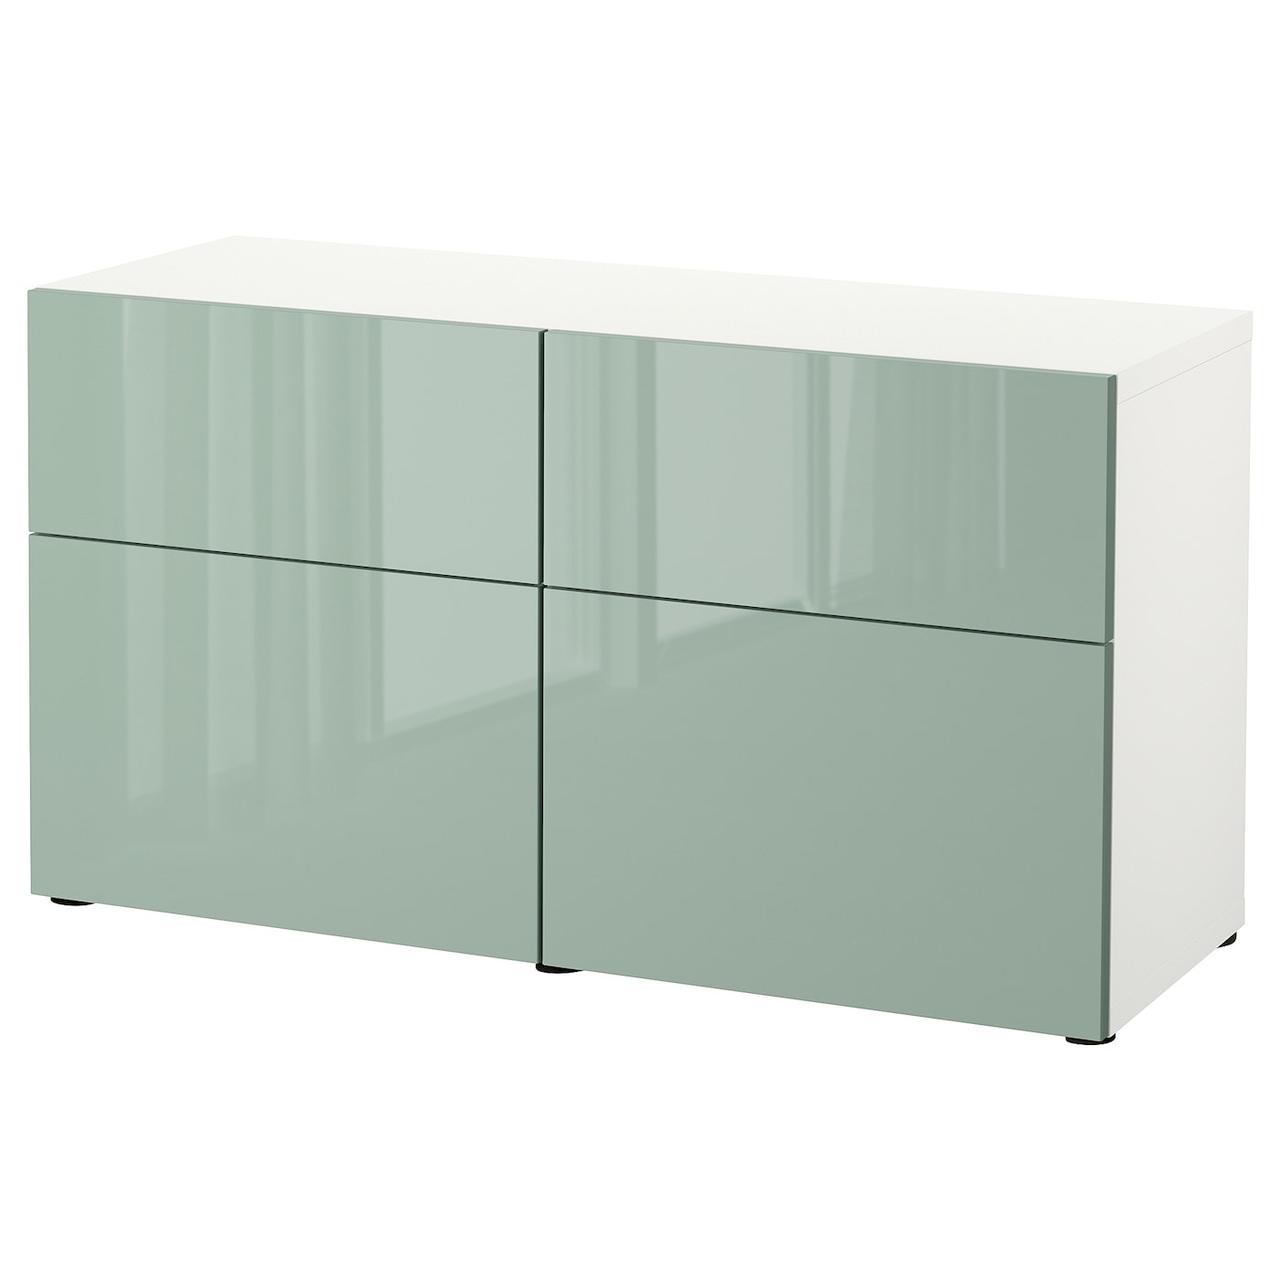 IKEA BESTA Тумба под телевизор 120x42x65 cm (793.248.84)